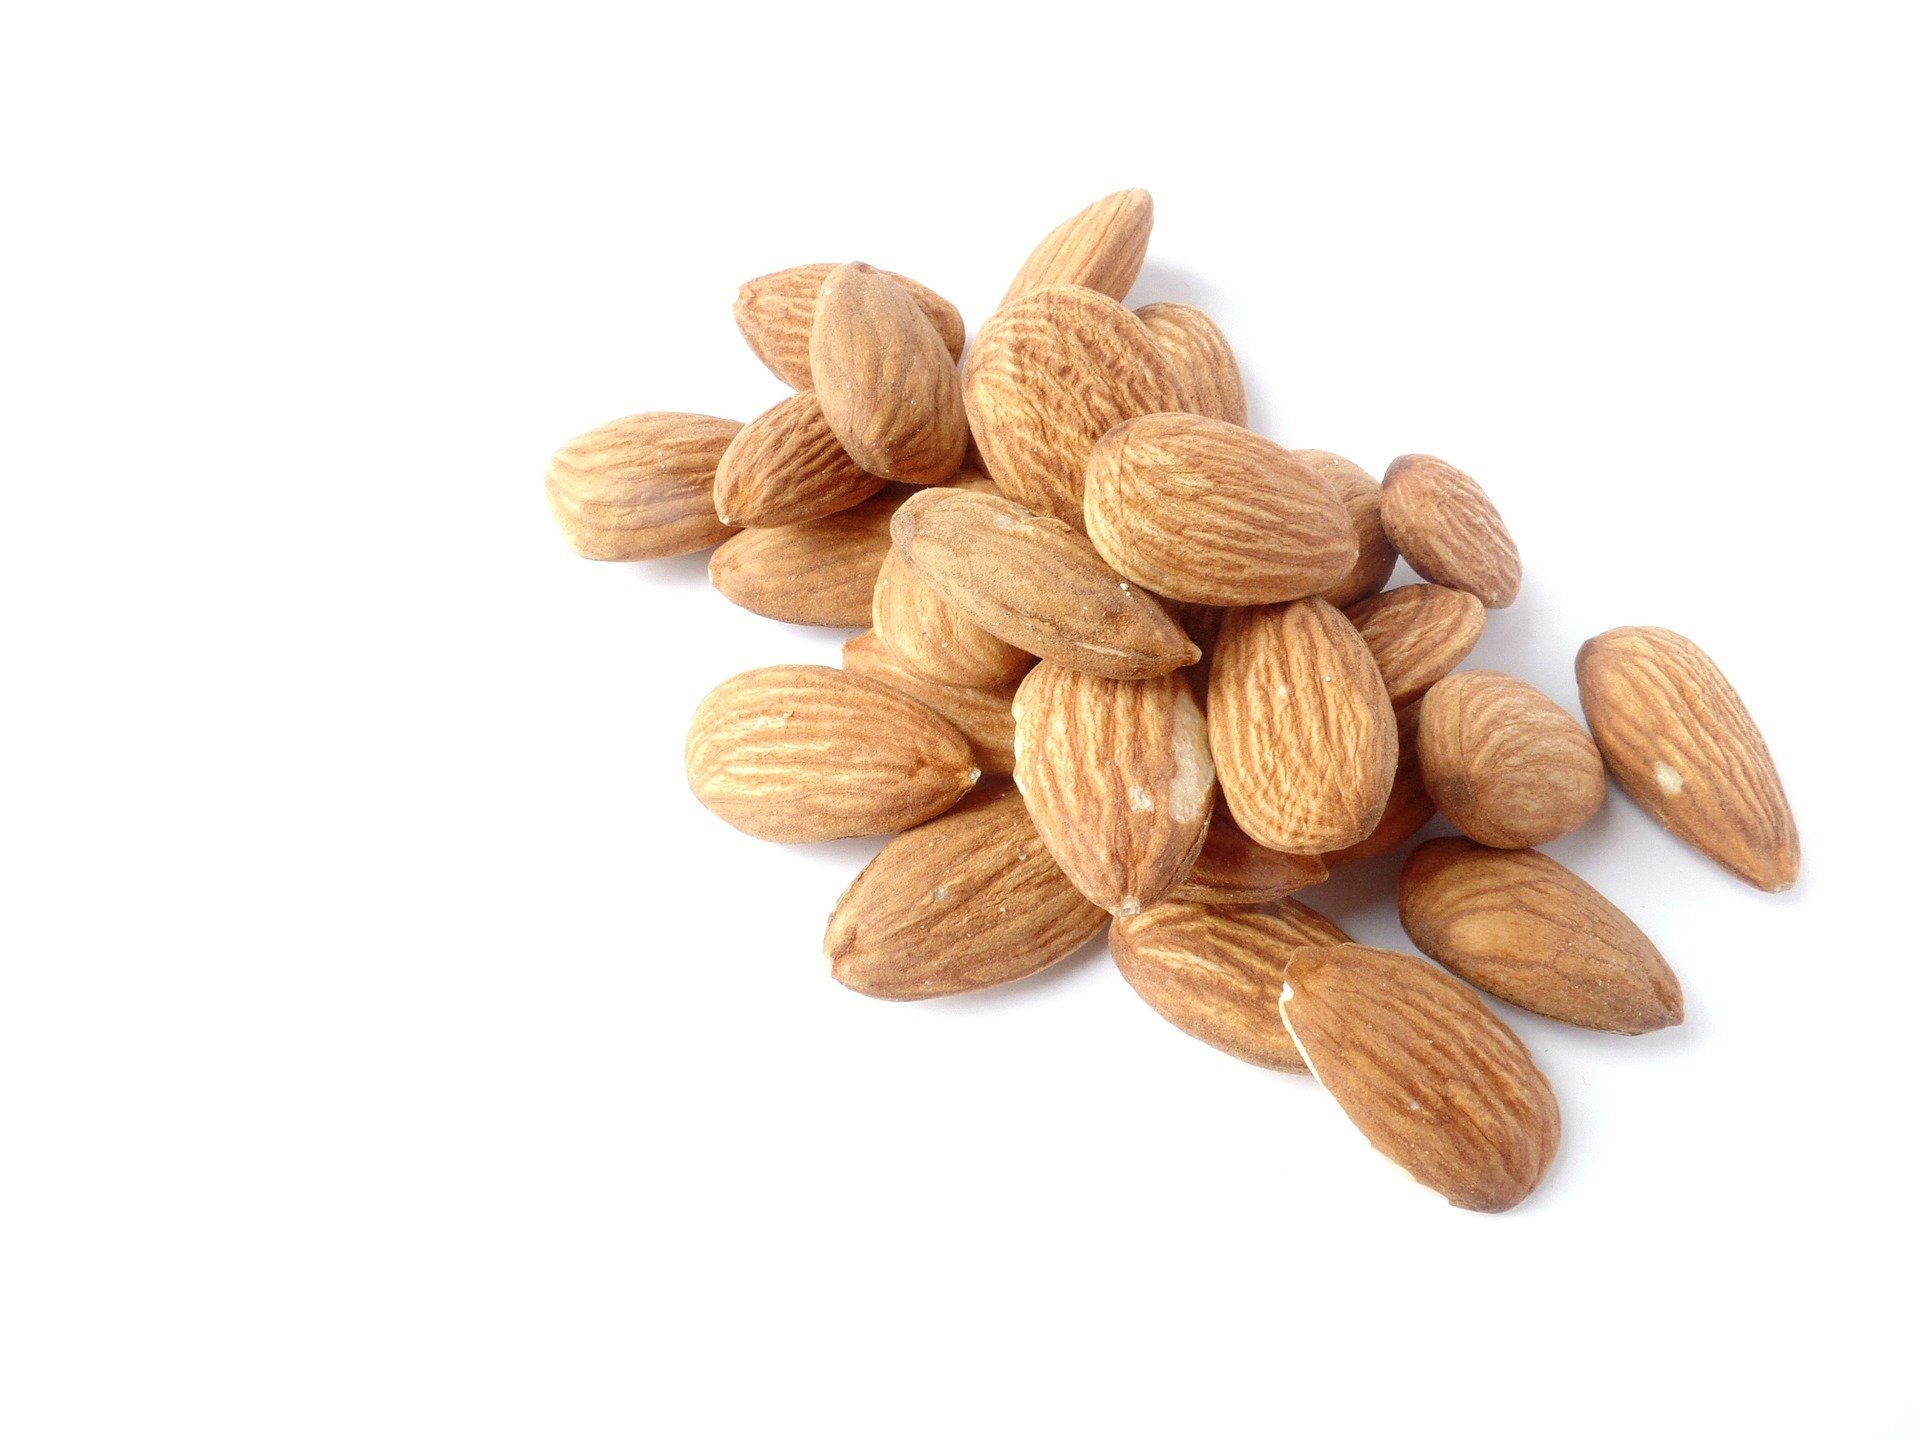 almonds-1567358_1920